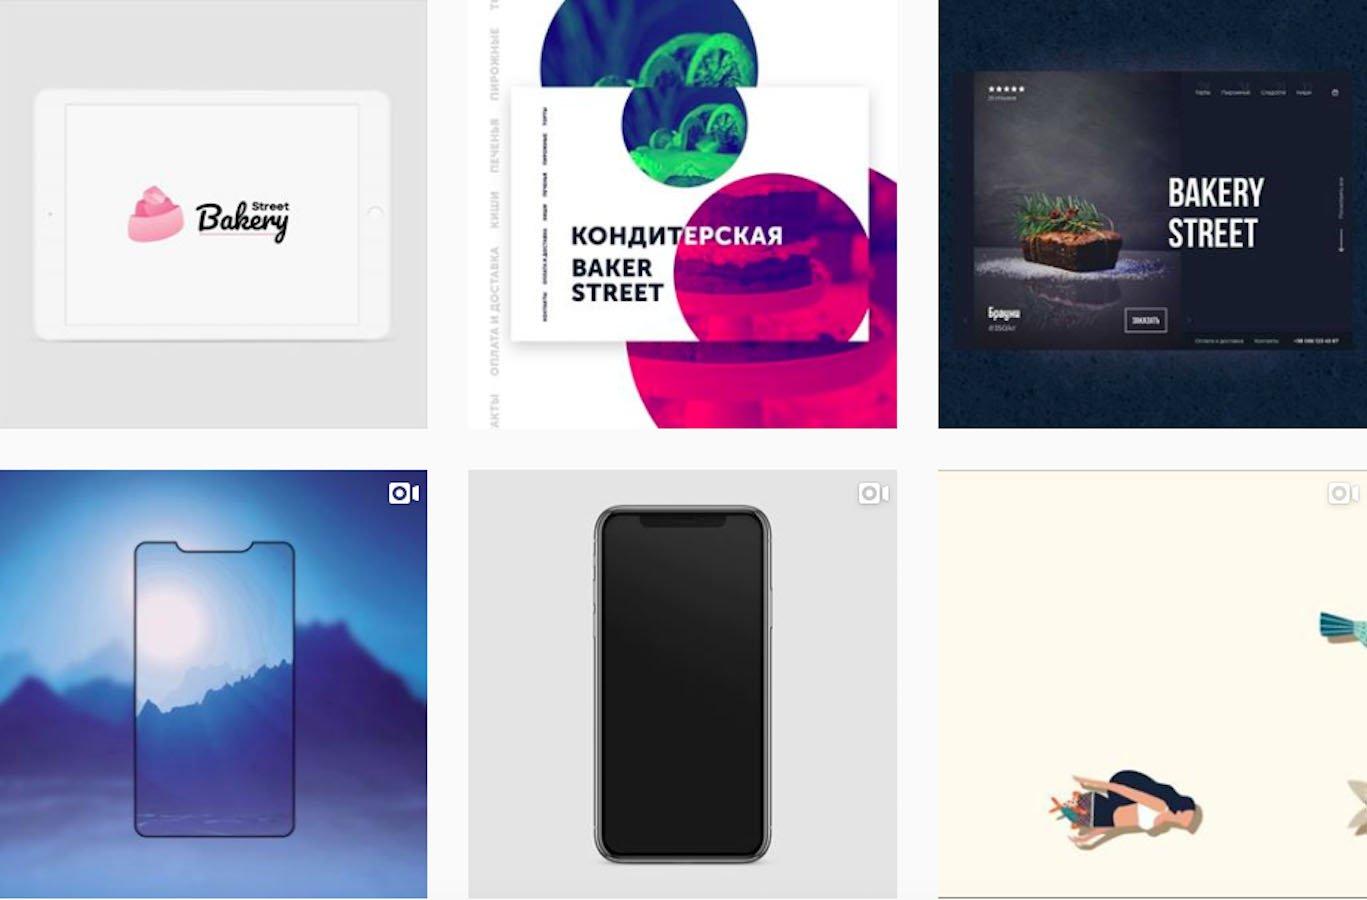 Web Design Inspiration: 110+ Accounts On Instagram and 10+ Best UX & Web Design Books in 2020 - cadabrachallenge